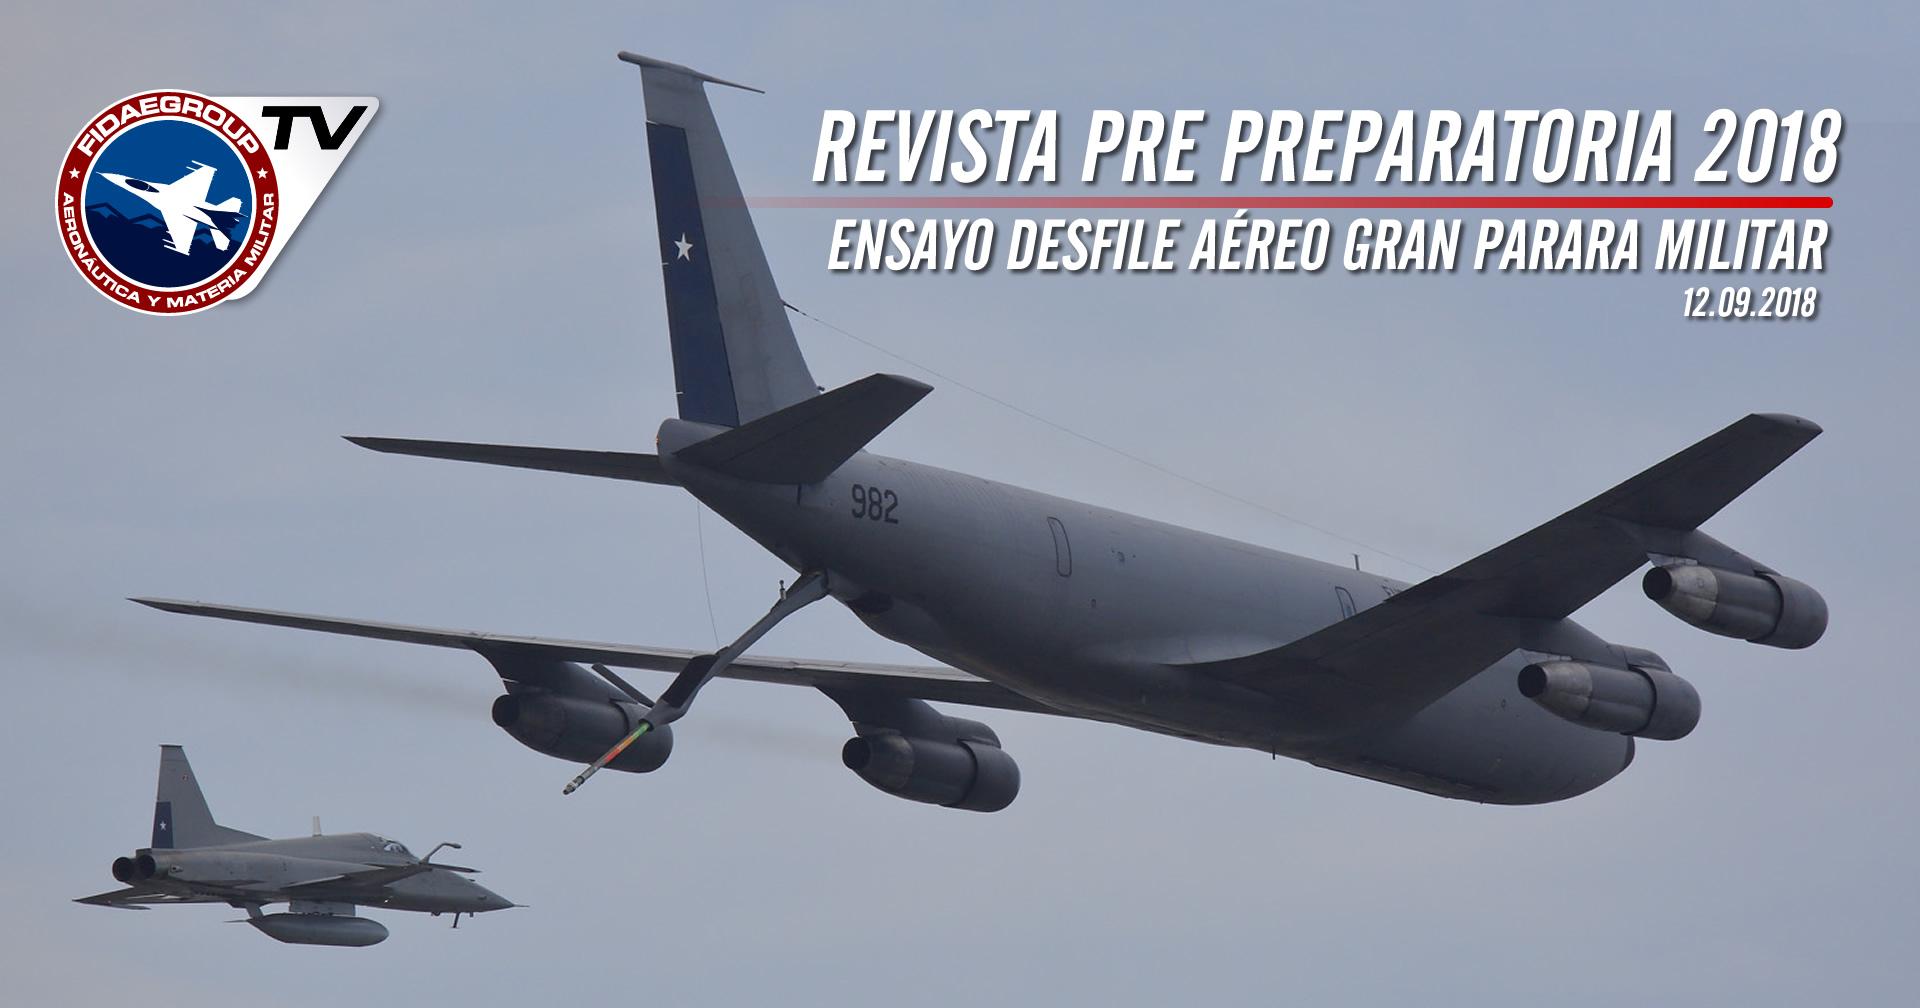 Ensayos Desfile Aéreo para Gran Parada Militar 2018